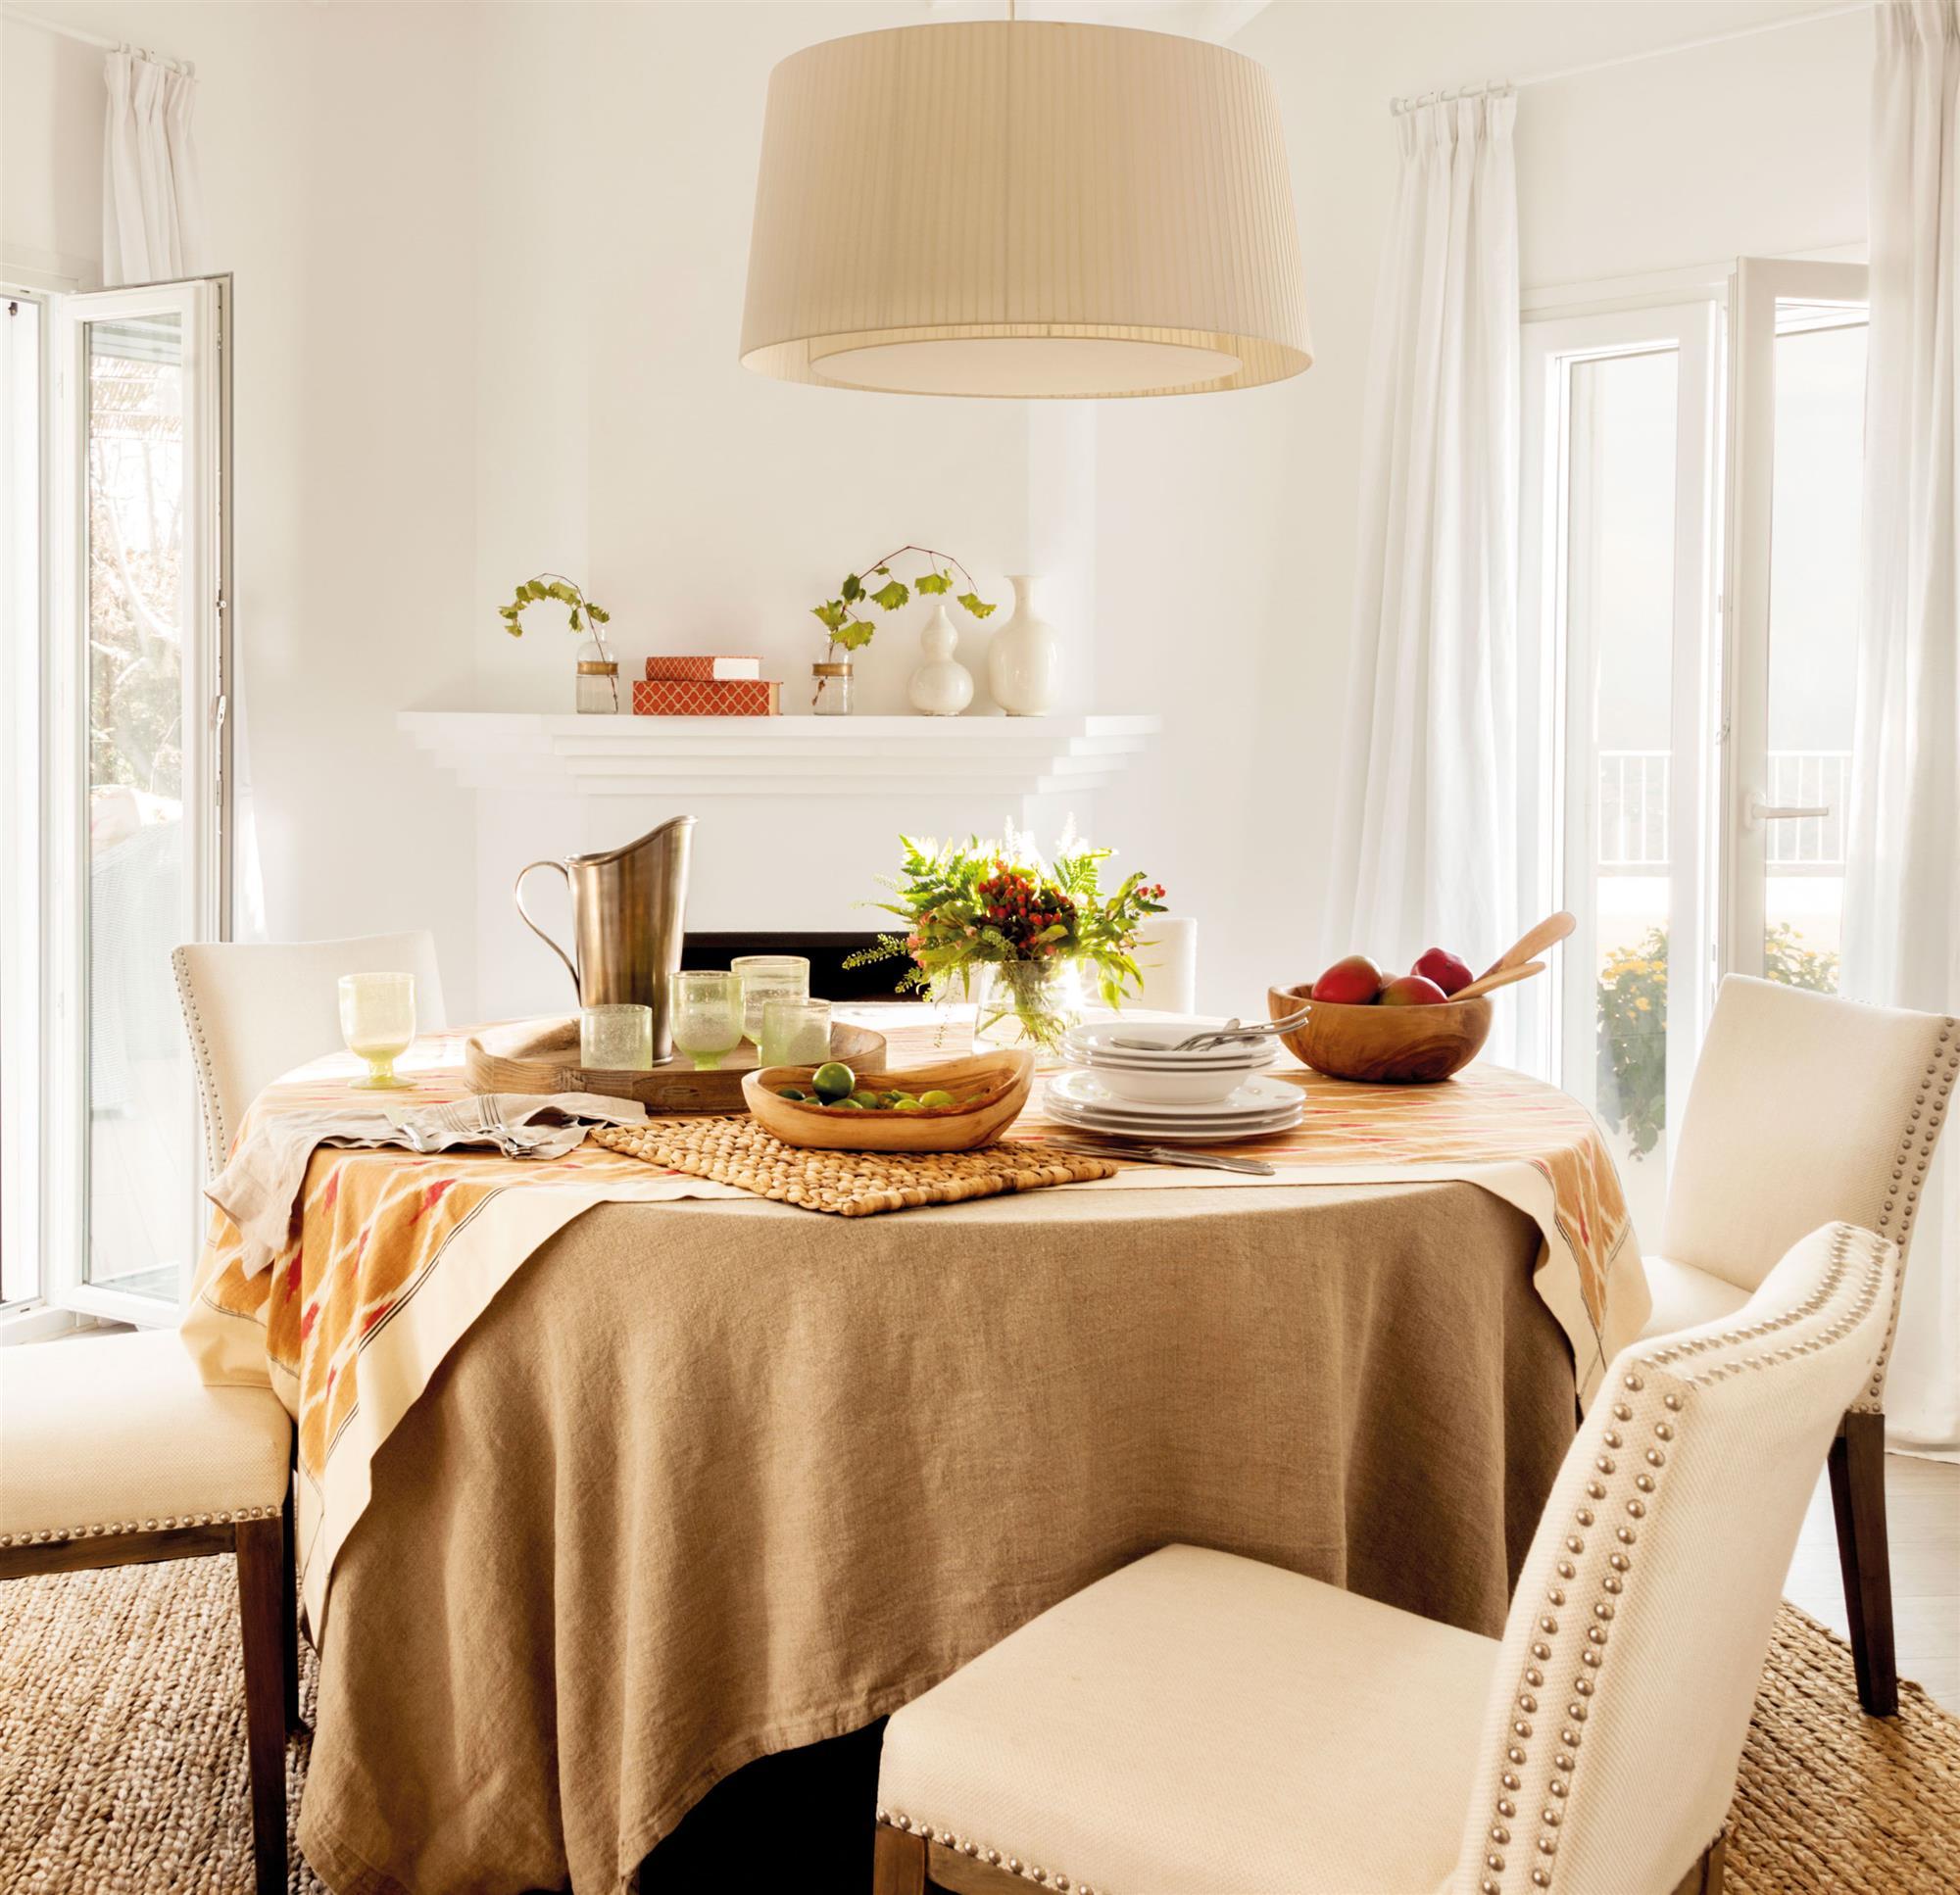 Decoraci n feng shui para tu casa blog de muebles y for Feng shui adornos para casa